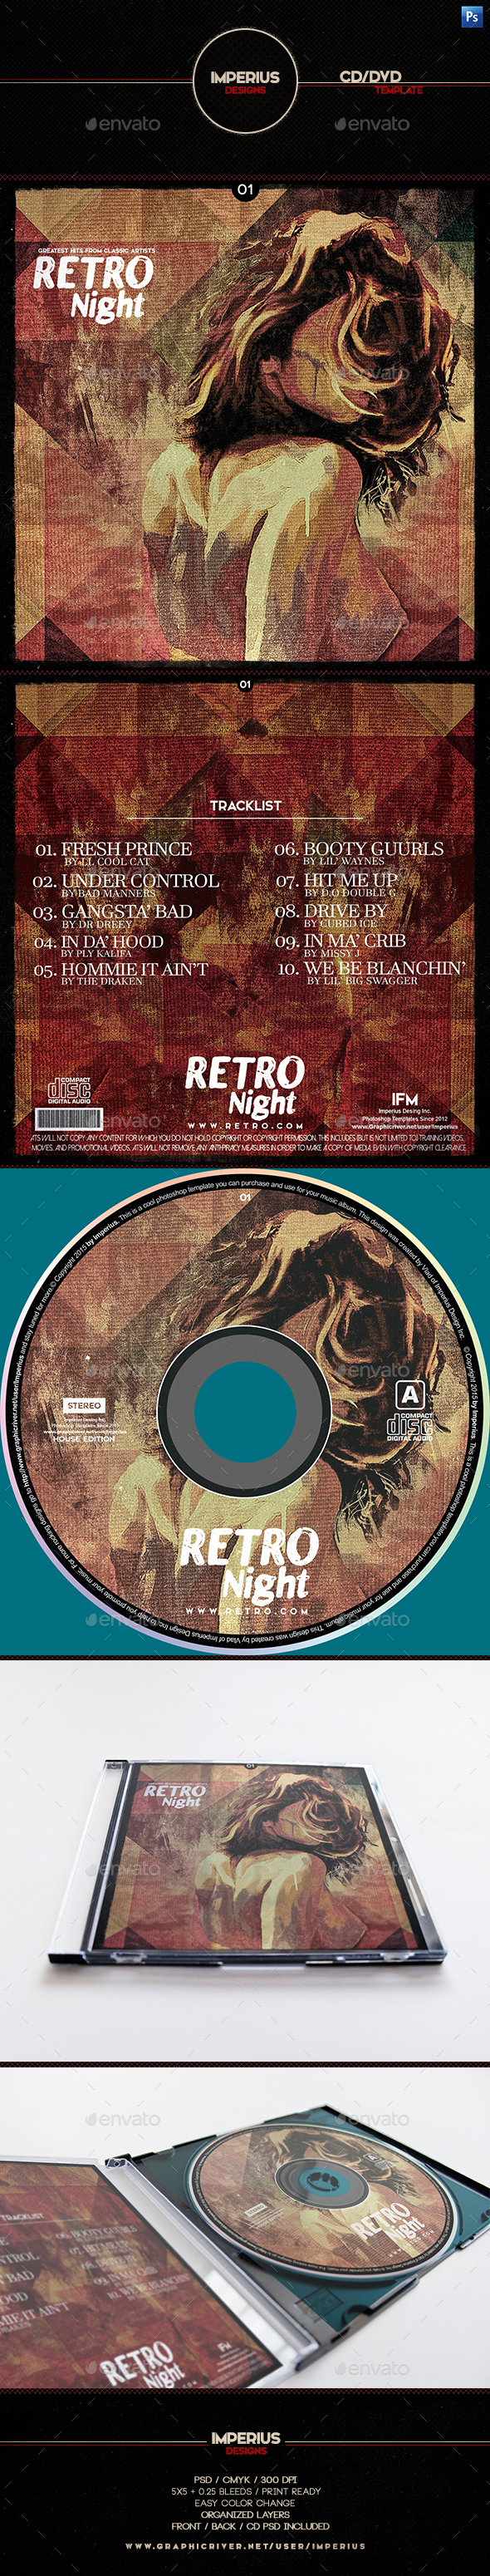 Retro Night V1 CD/DVD Cover - CD & DVD Artwork Print Templates